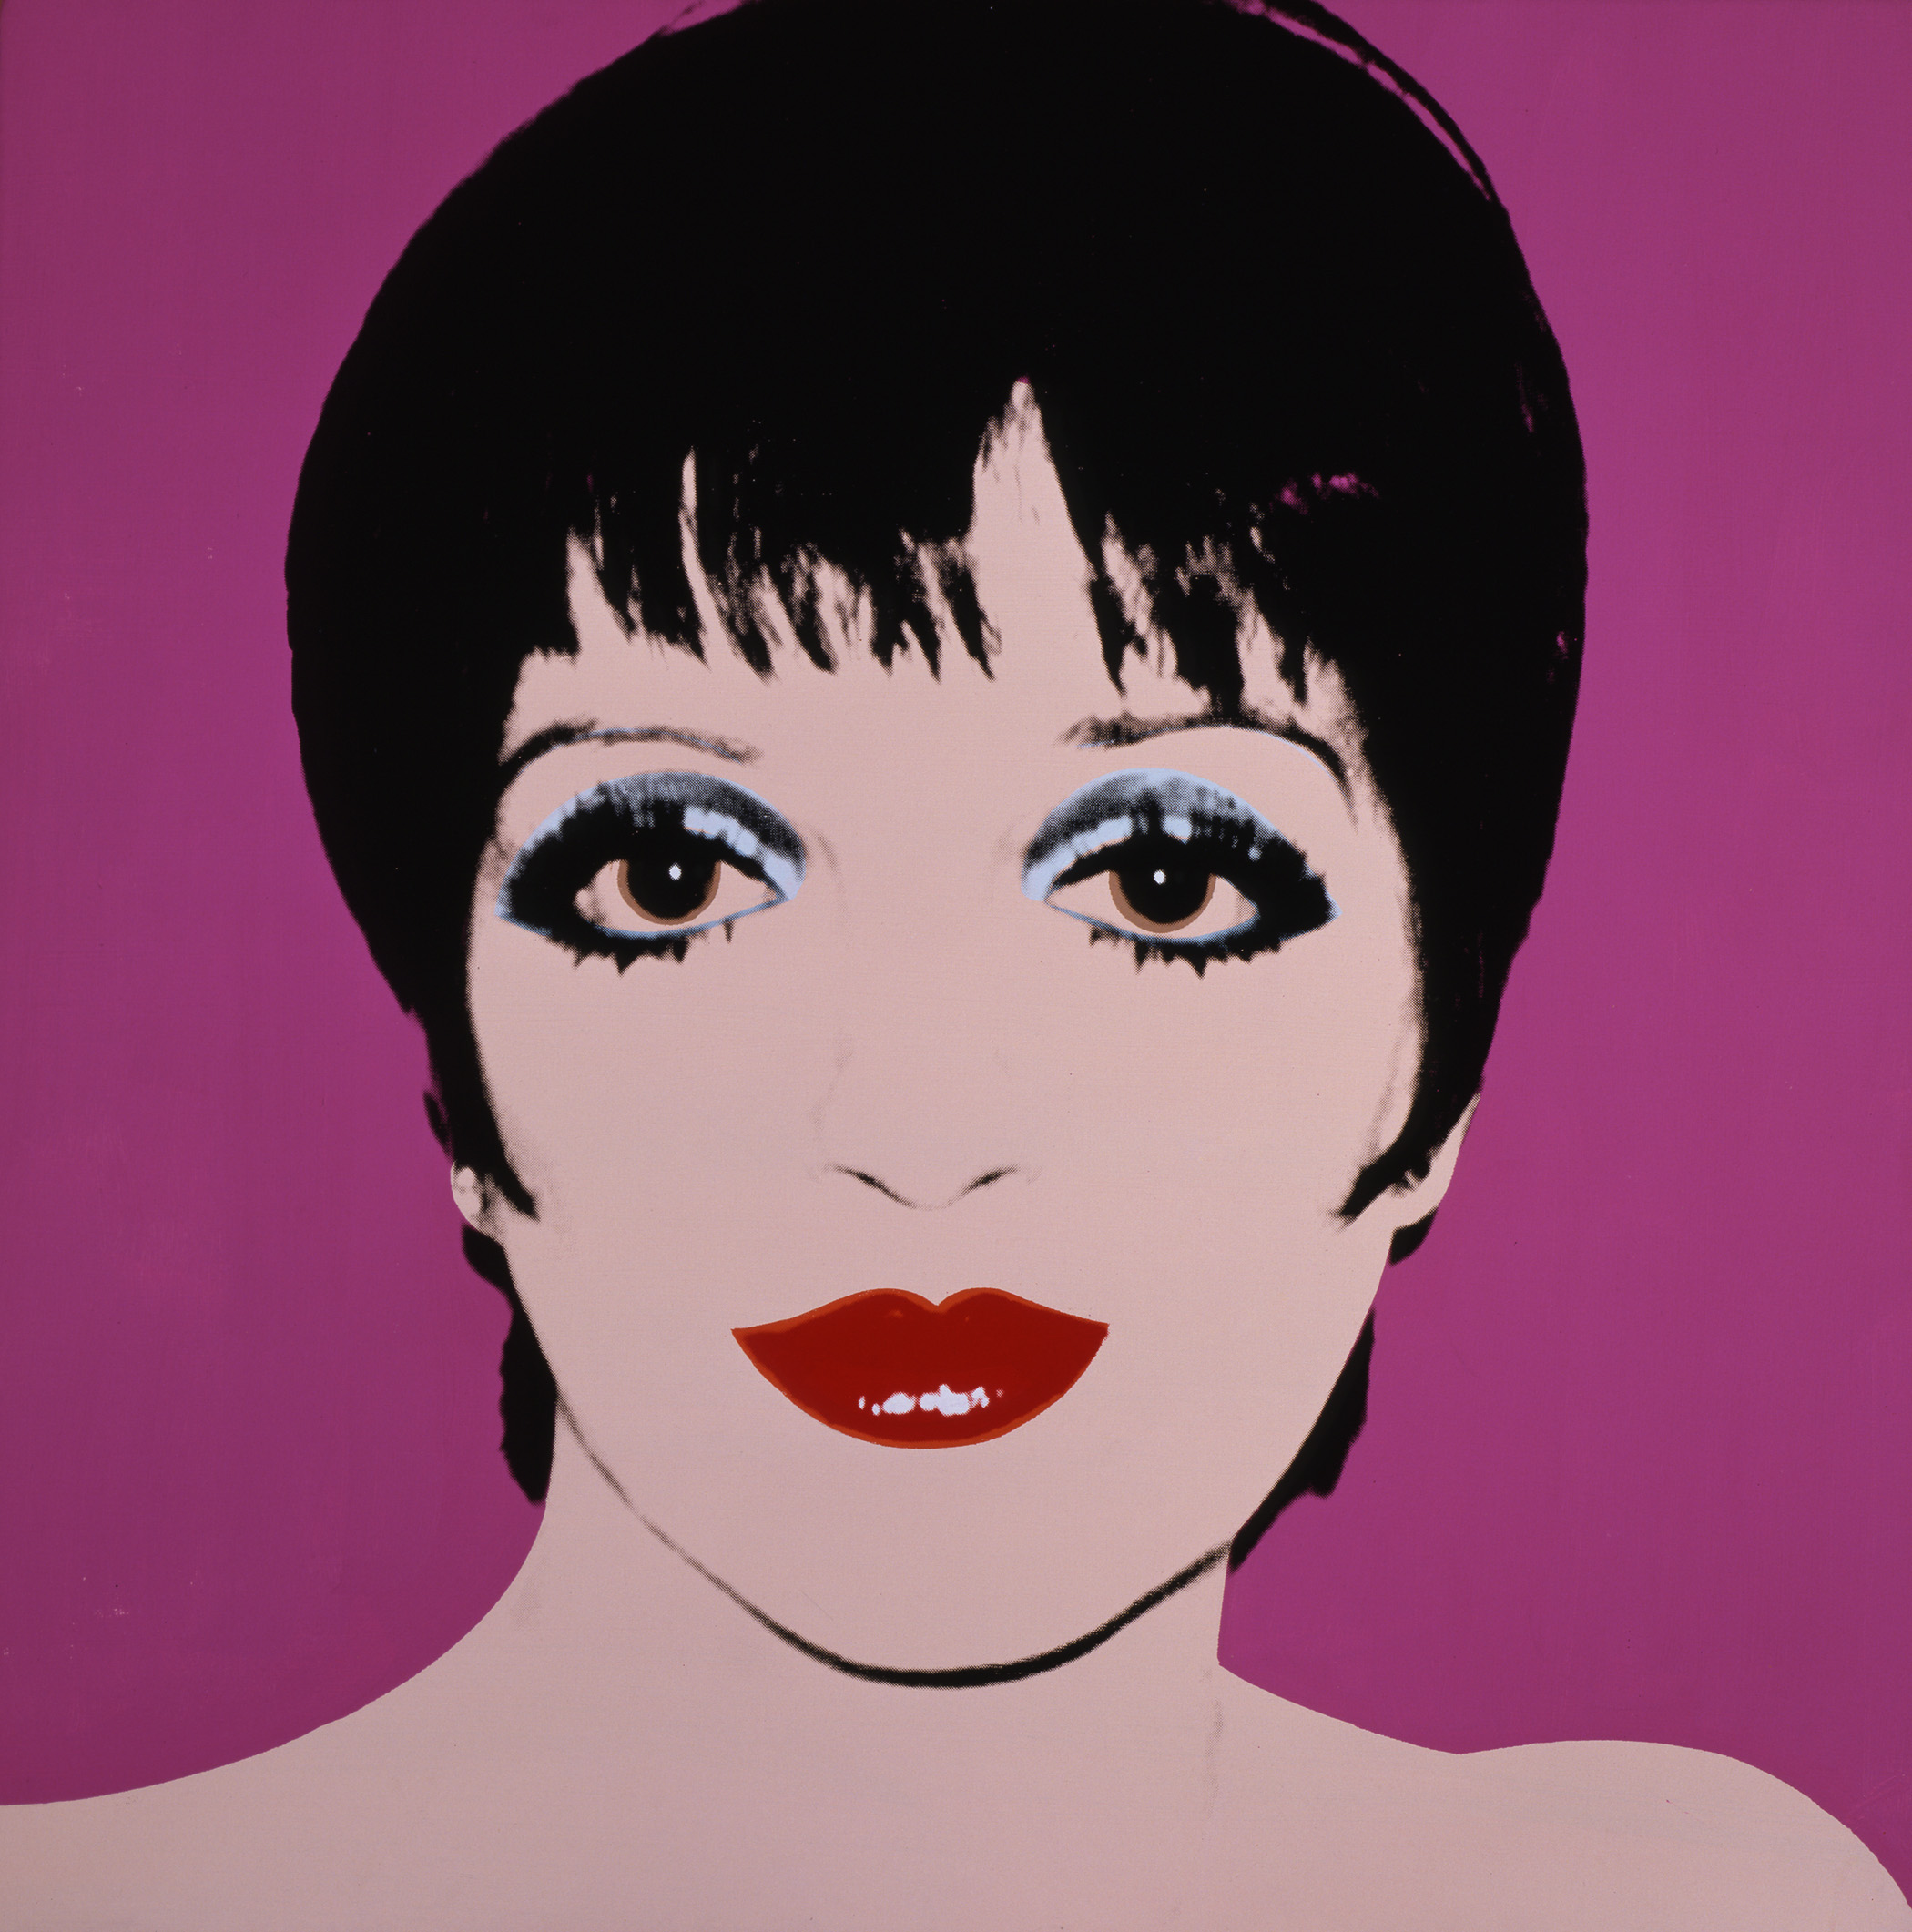 8_Andy_Warhol_Liza_Minnelli_1979_AWF_Courtesy_The_Andy_Warhol_Museum_2.jpg